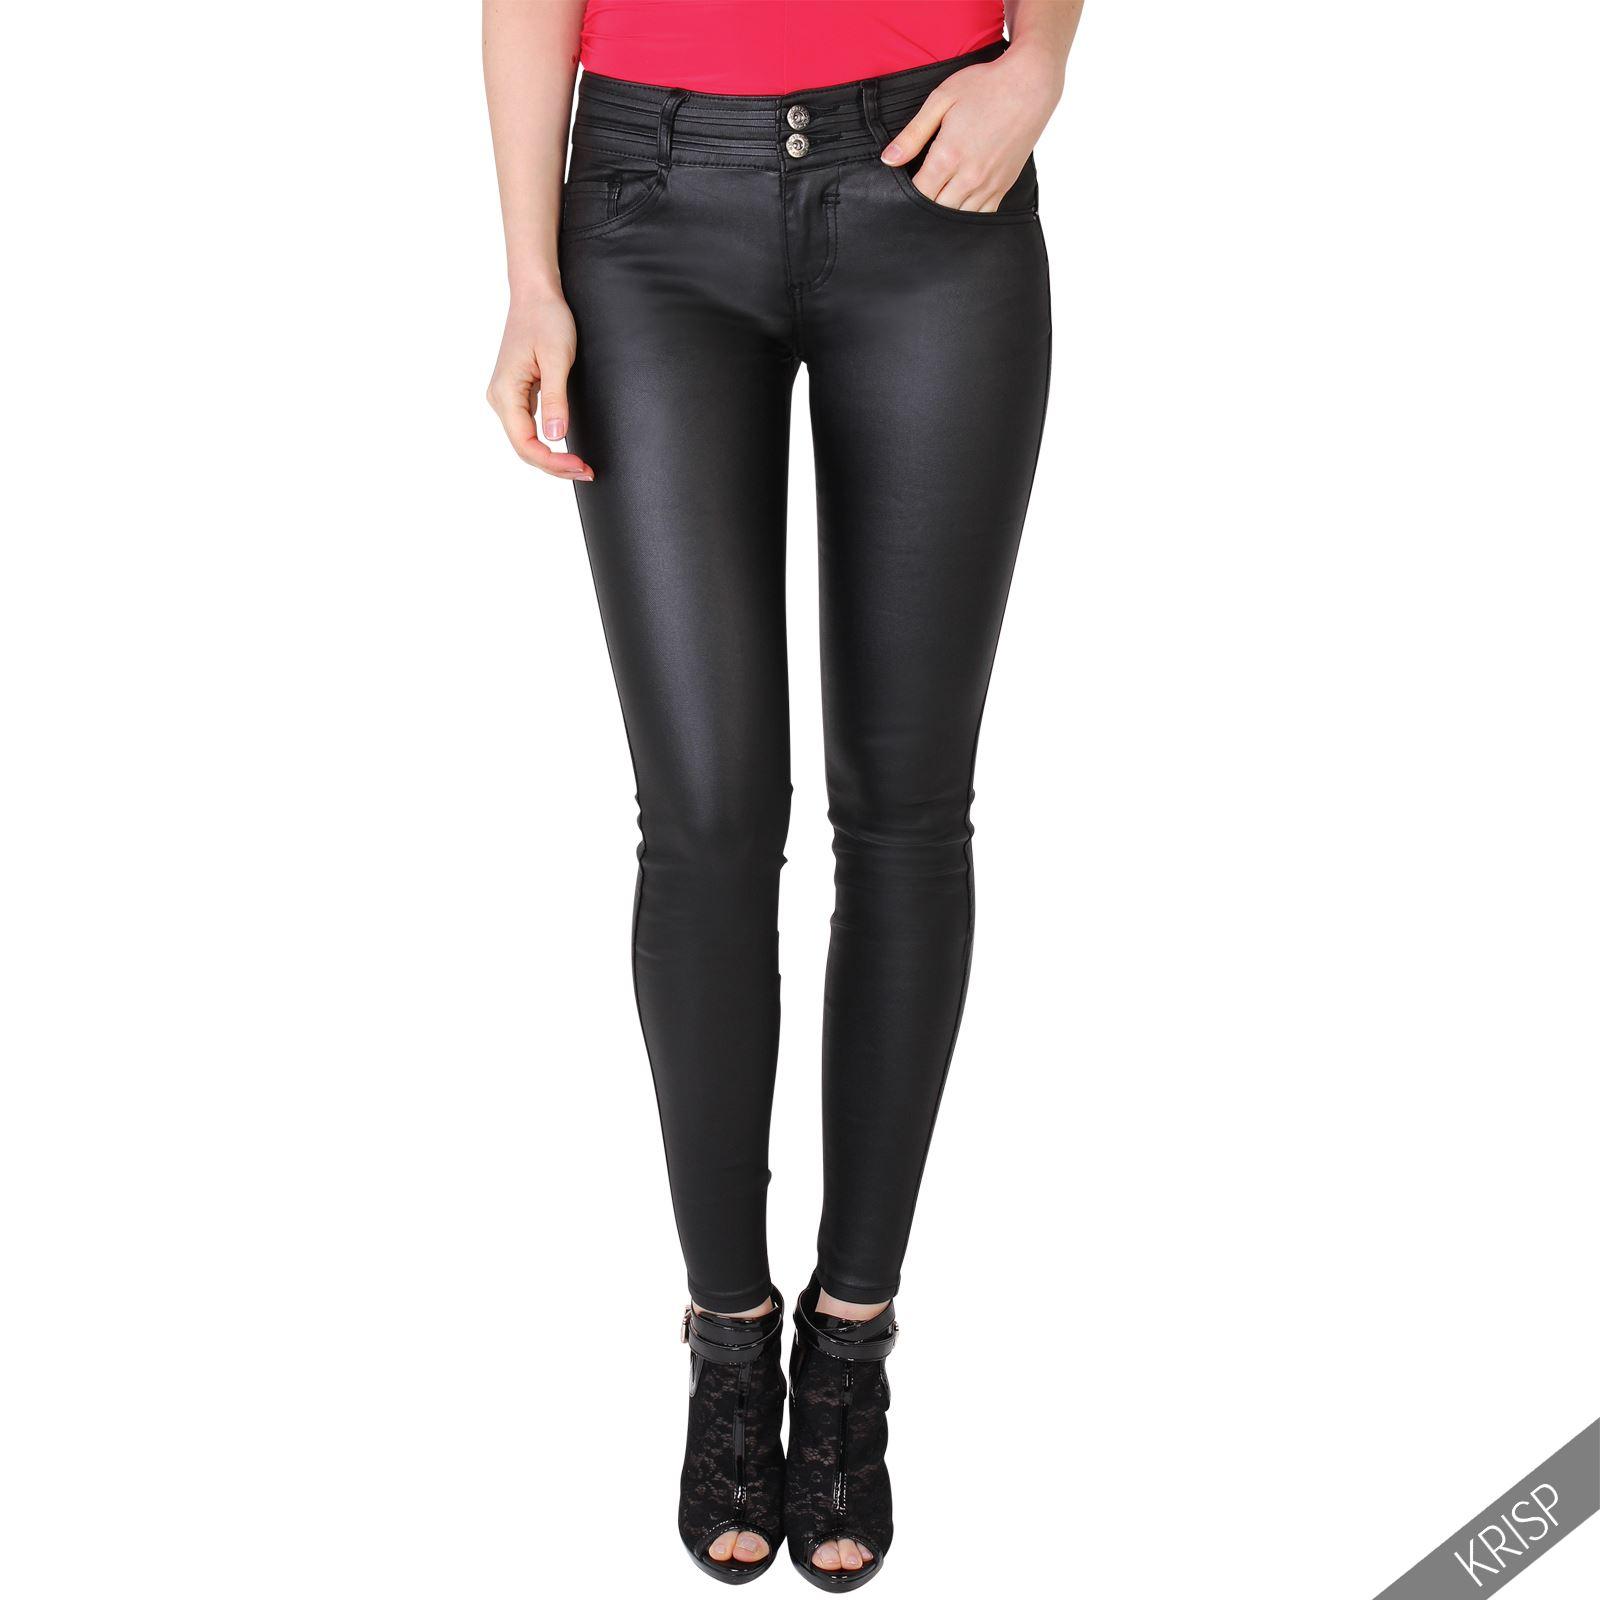 Brilliant WomensWetLookPULeatherStretchSkinnySexyJeansTrousersPants